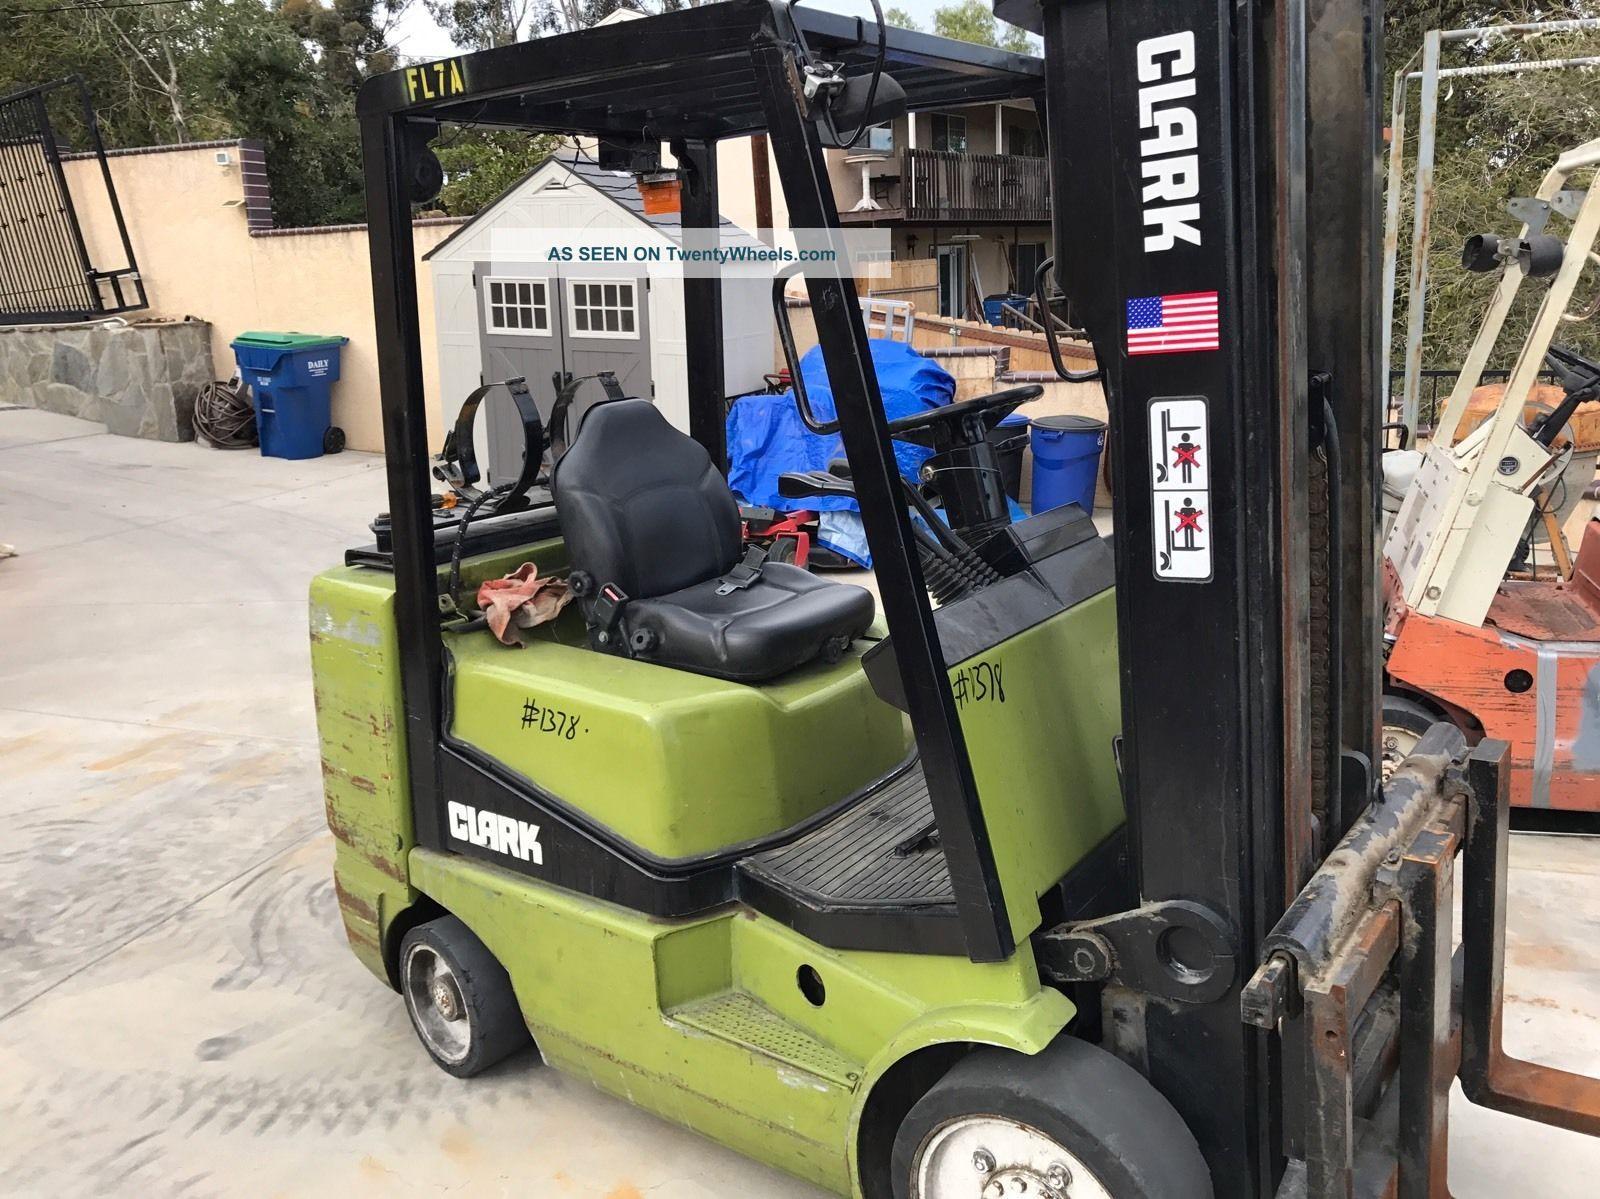 Clark Cgc30 6000lb Propane Forklift Lift Truck For Repair